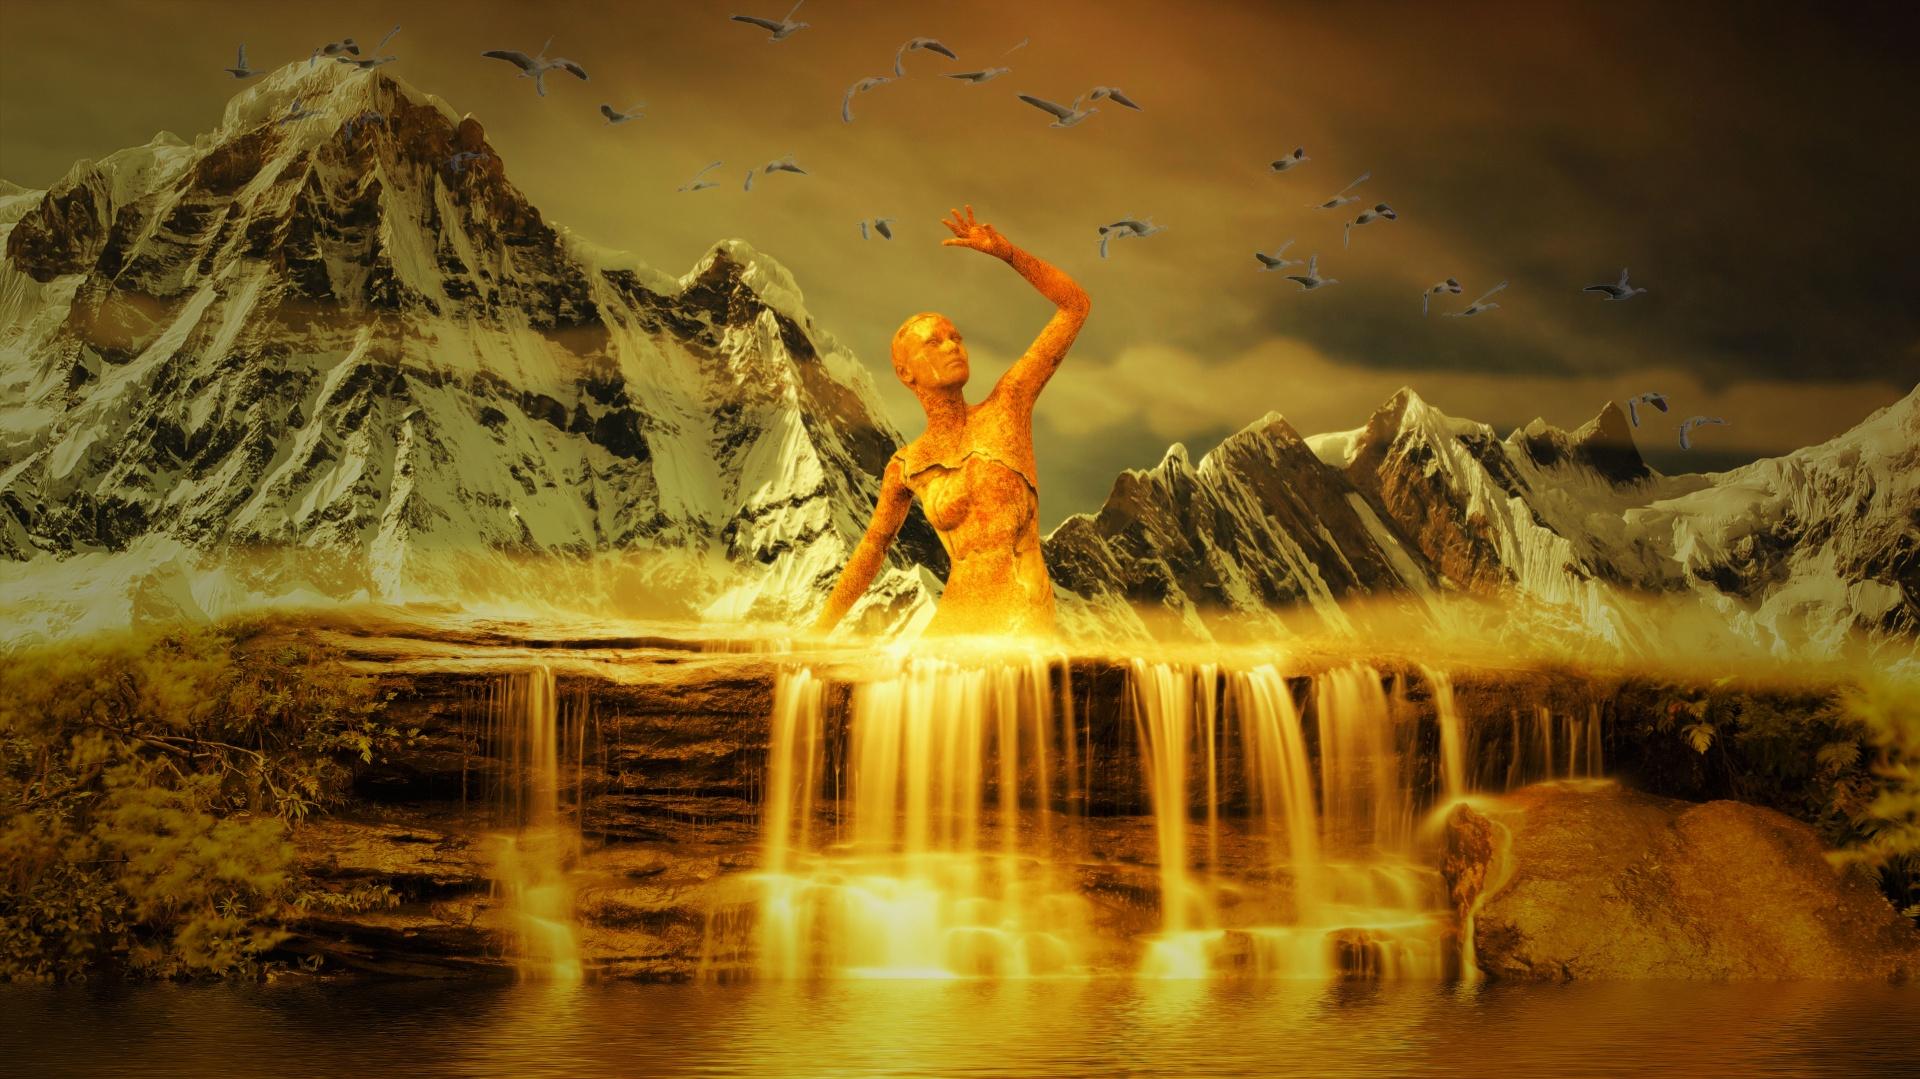 Wasserfall fantasy Kostenloses Stock Bild  Public Domain